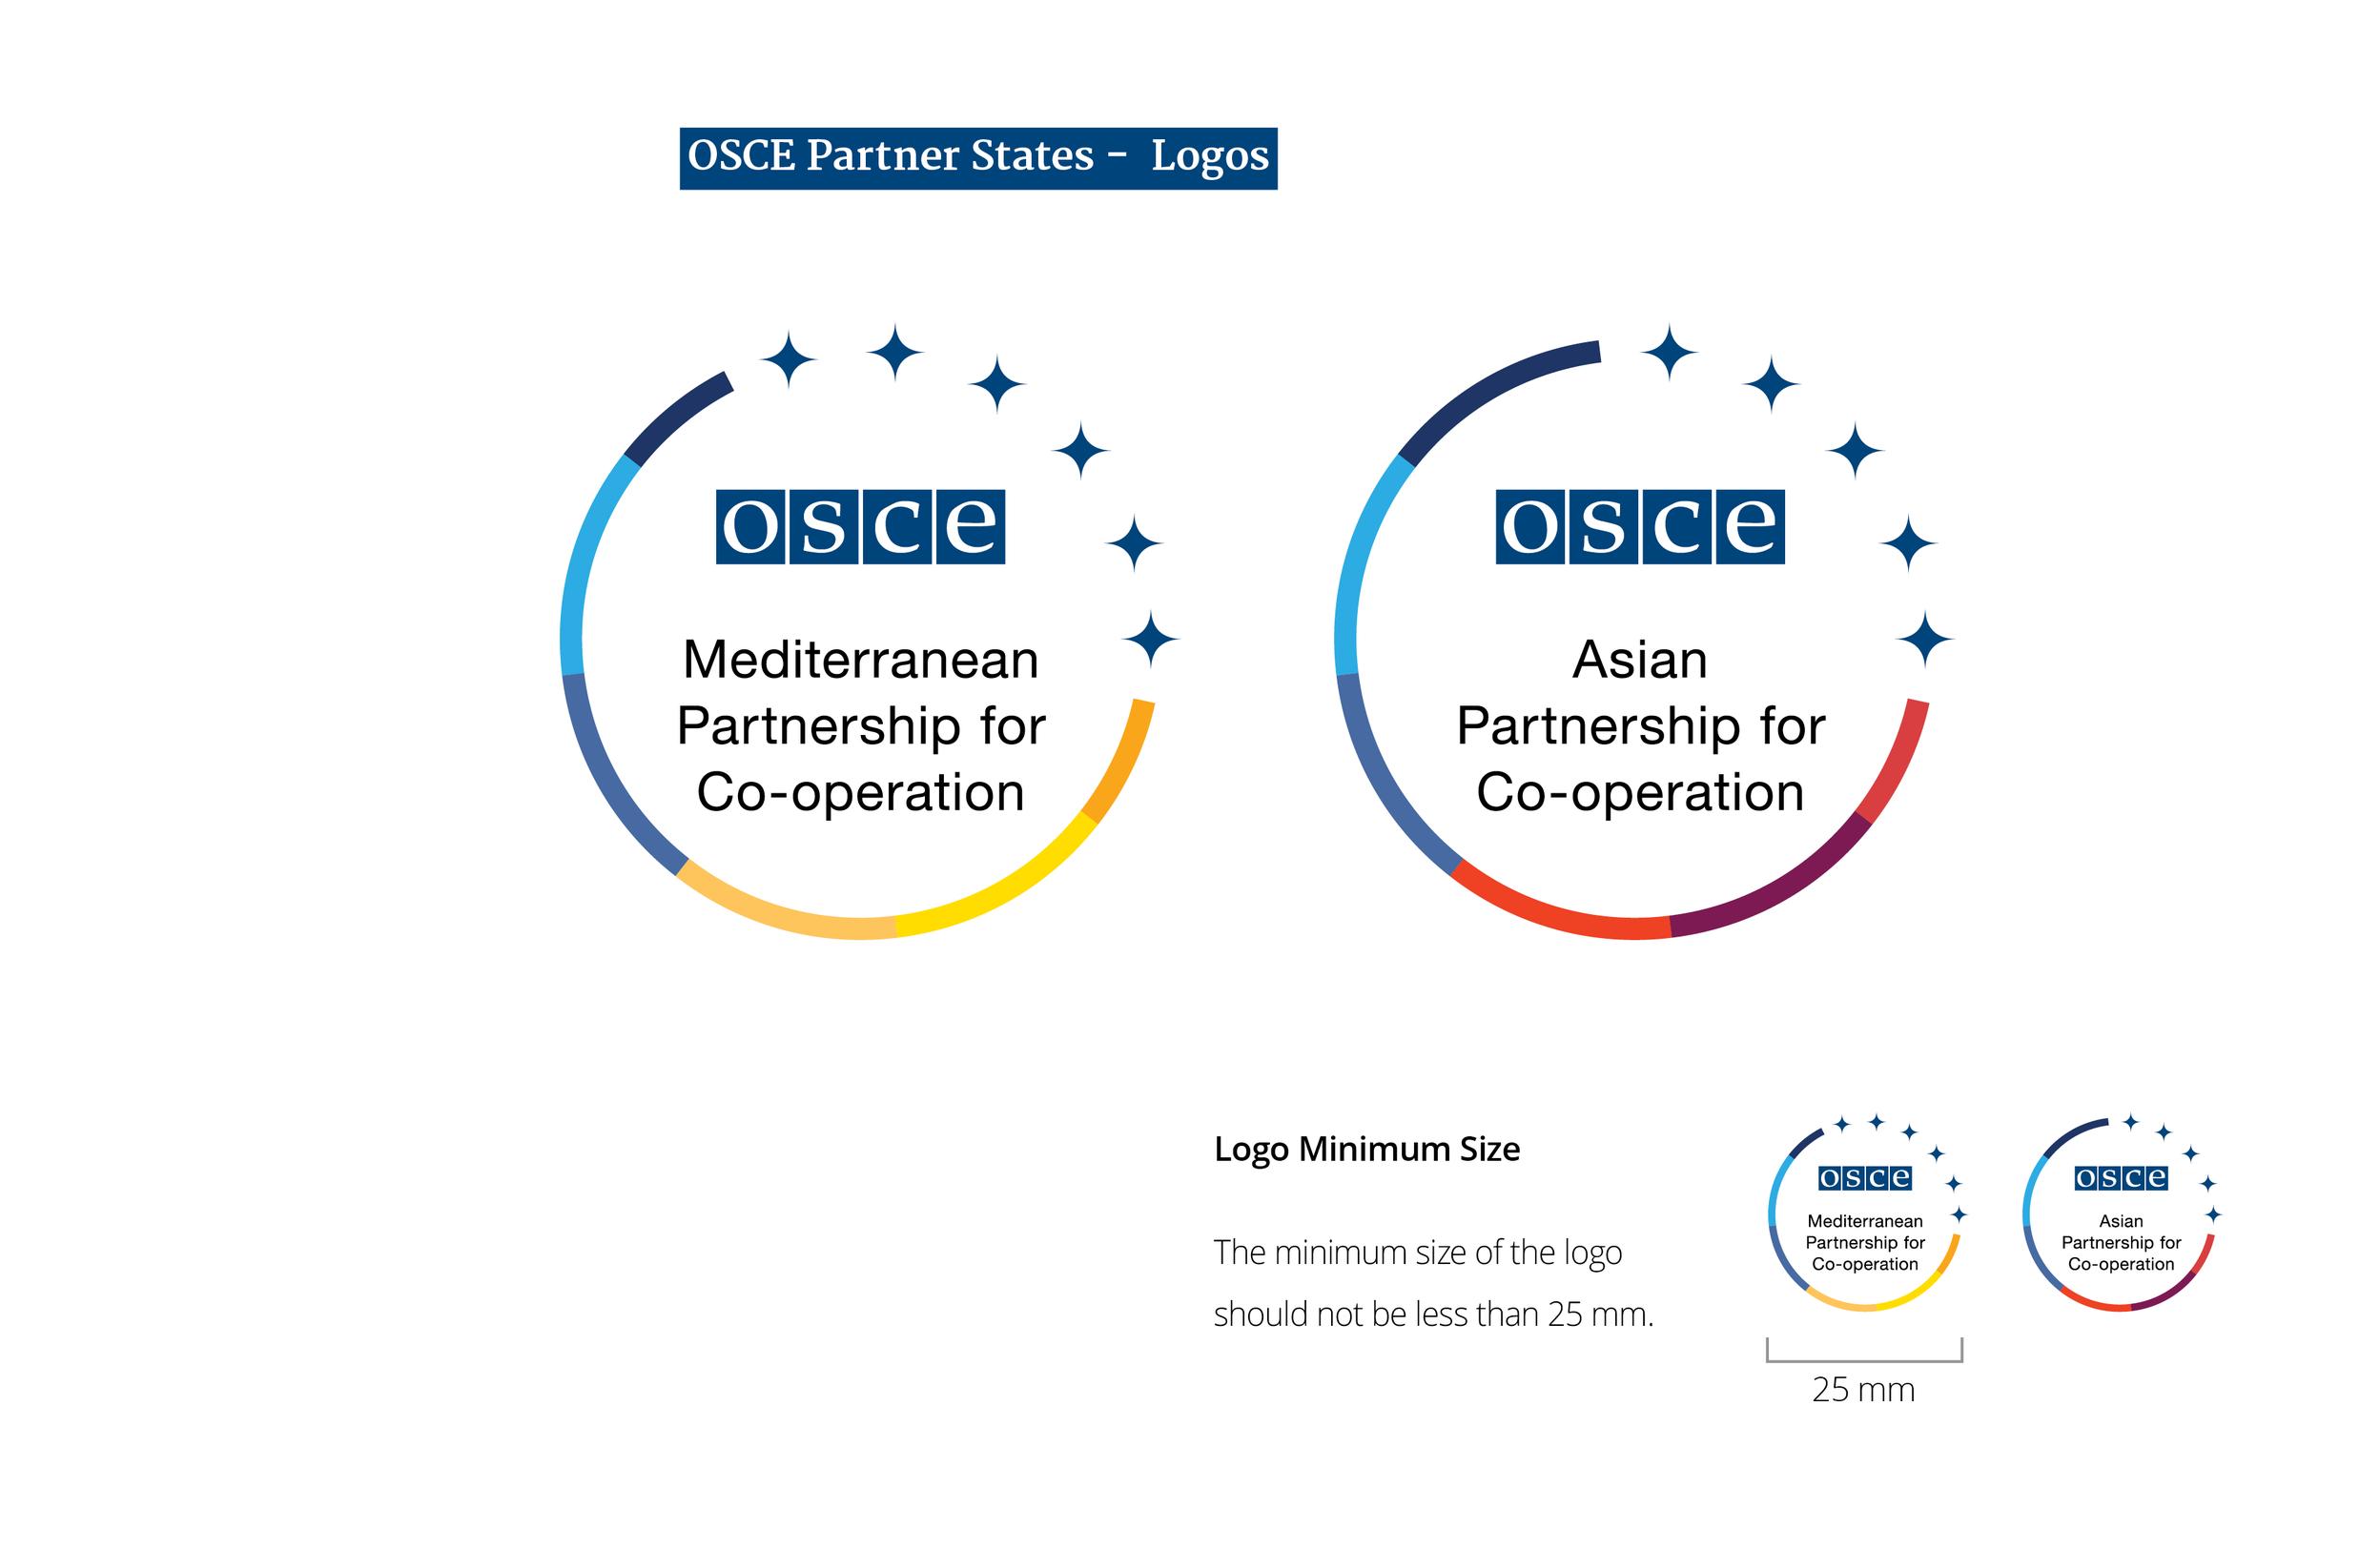 OSCE_Partnership_Logo_Graphic_Charter_3110169.png